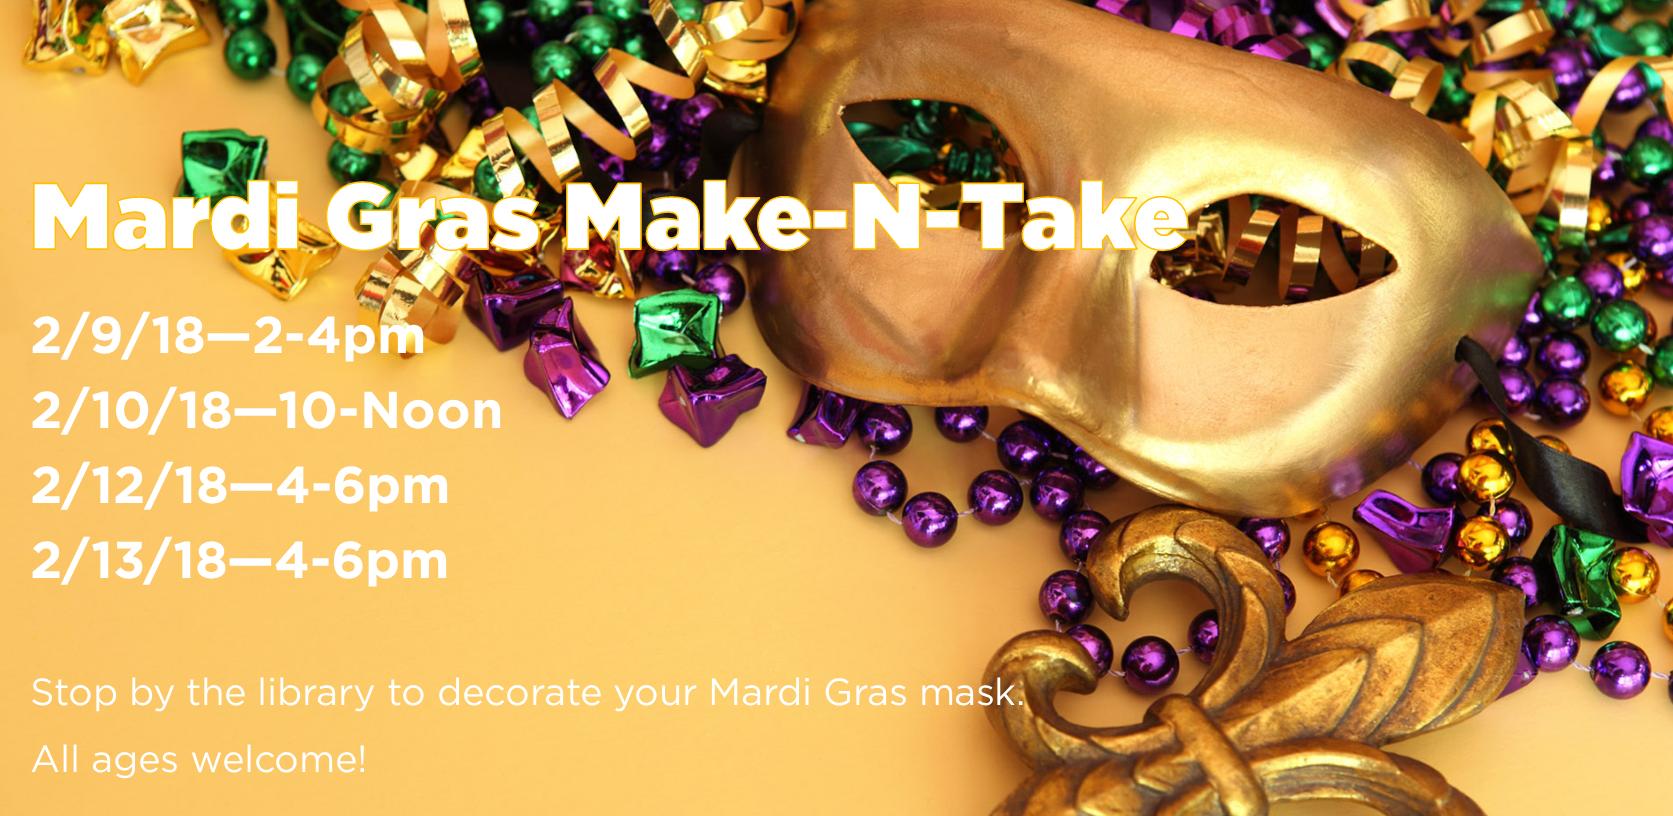 Mardi Gras Make-N-Take